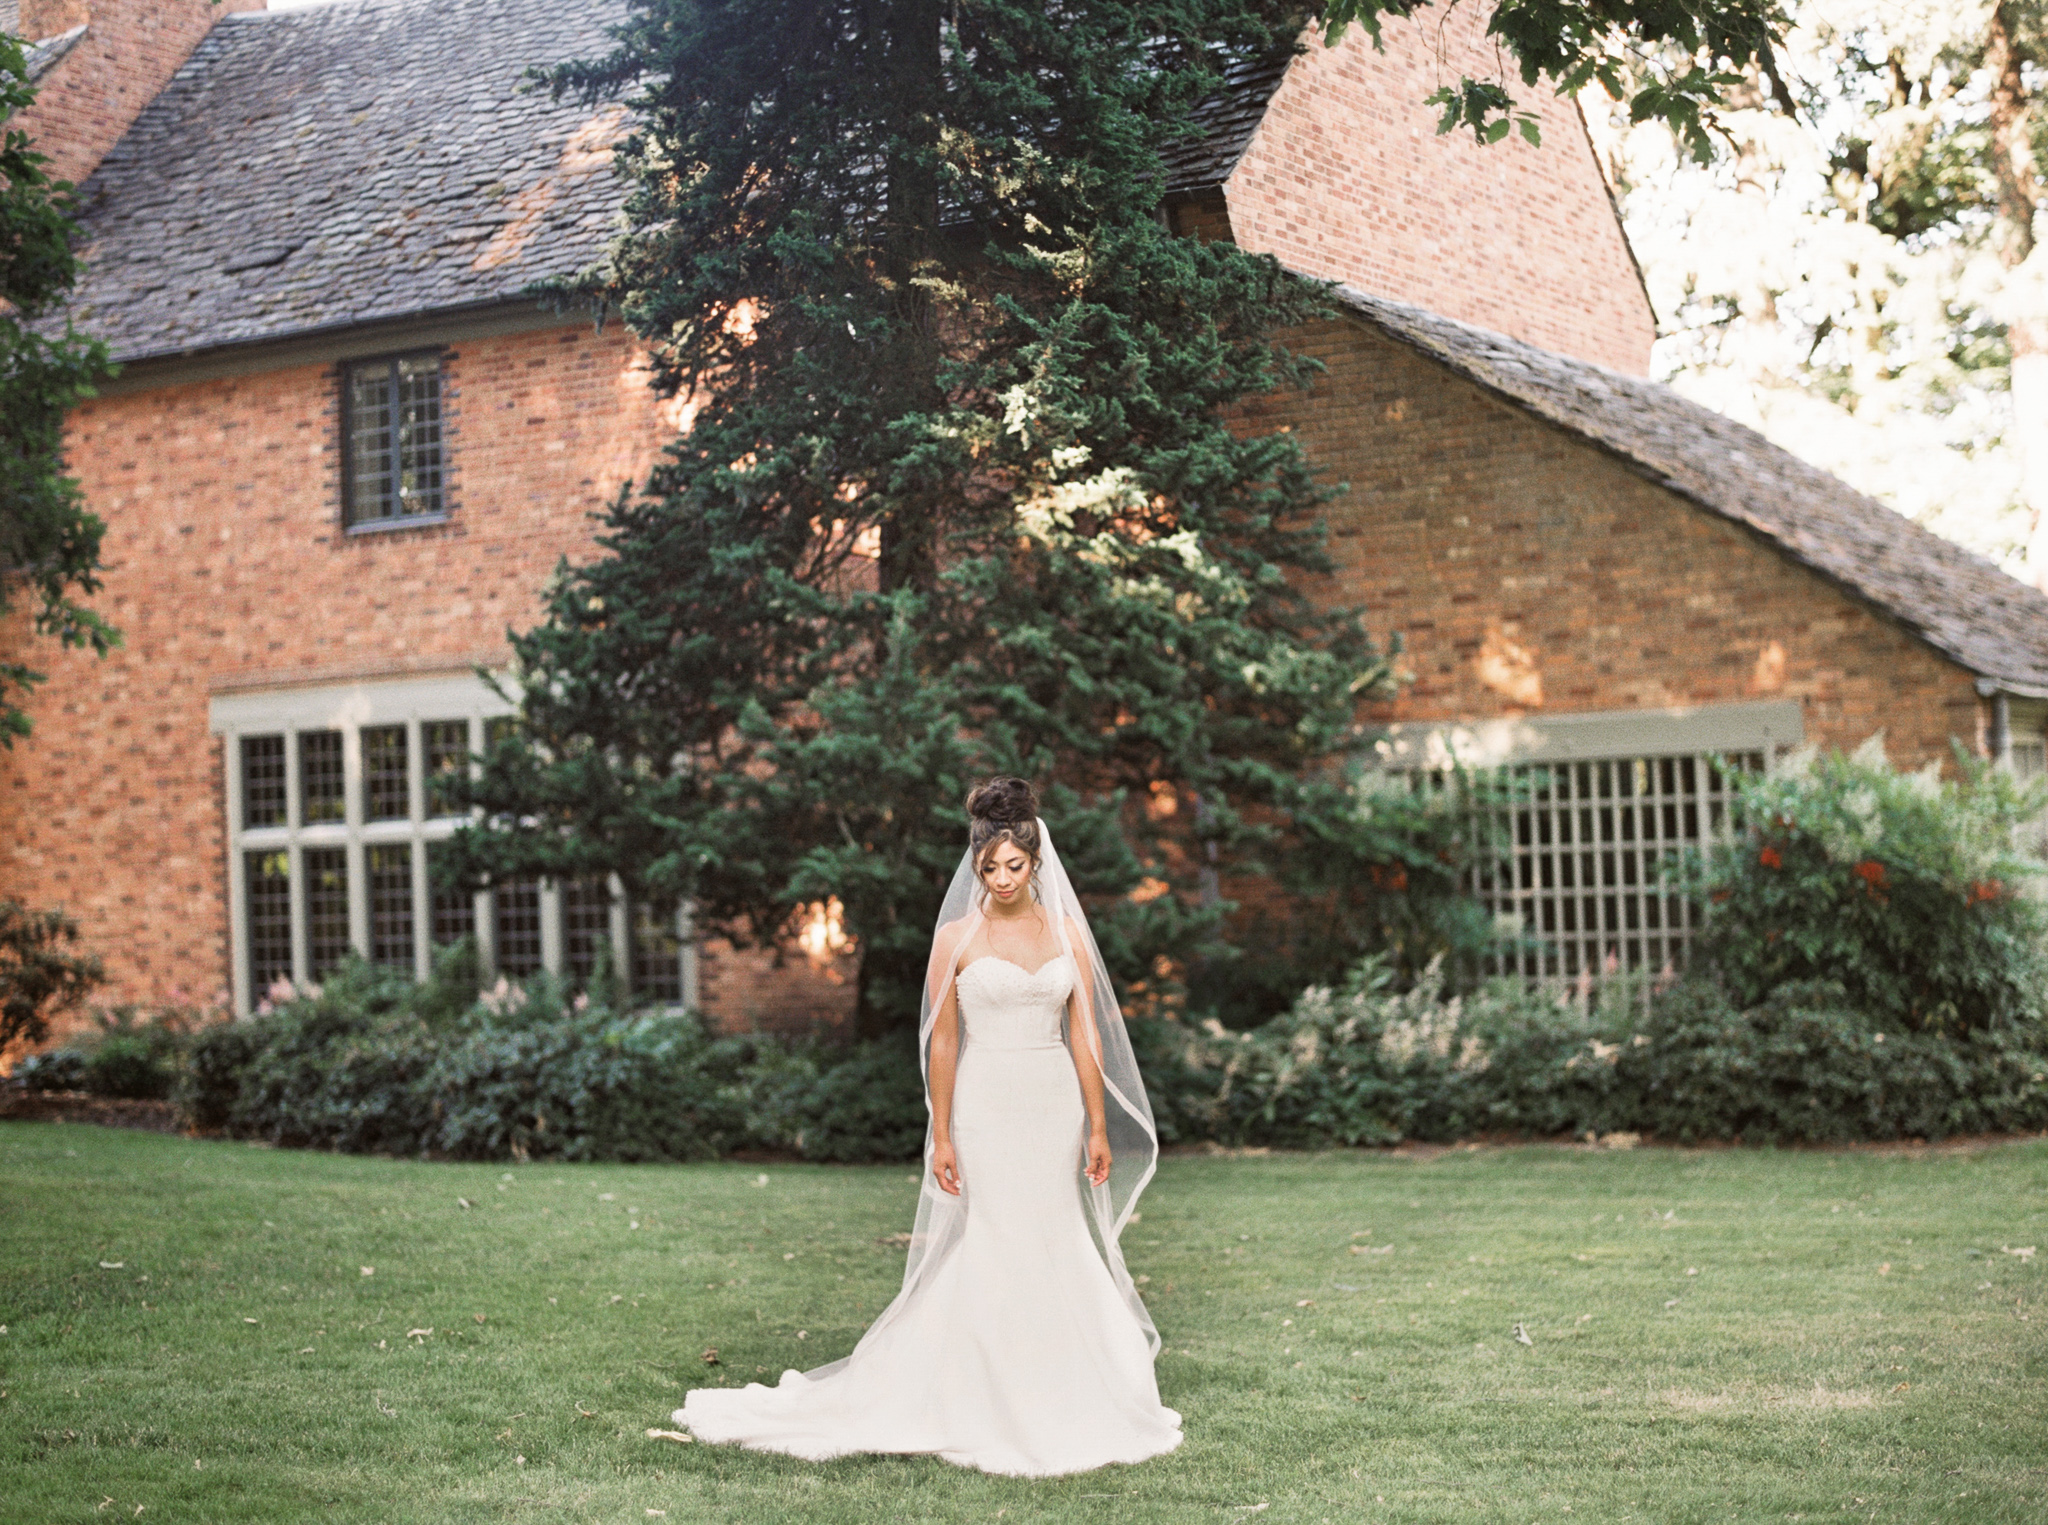 097OutliveCreative_Travel_Photographer_Videographer_Lewis&Clark_Oregon_Elegant_BlackTie_Destination_Wedding.jpg